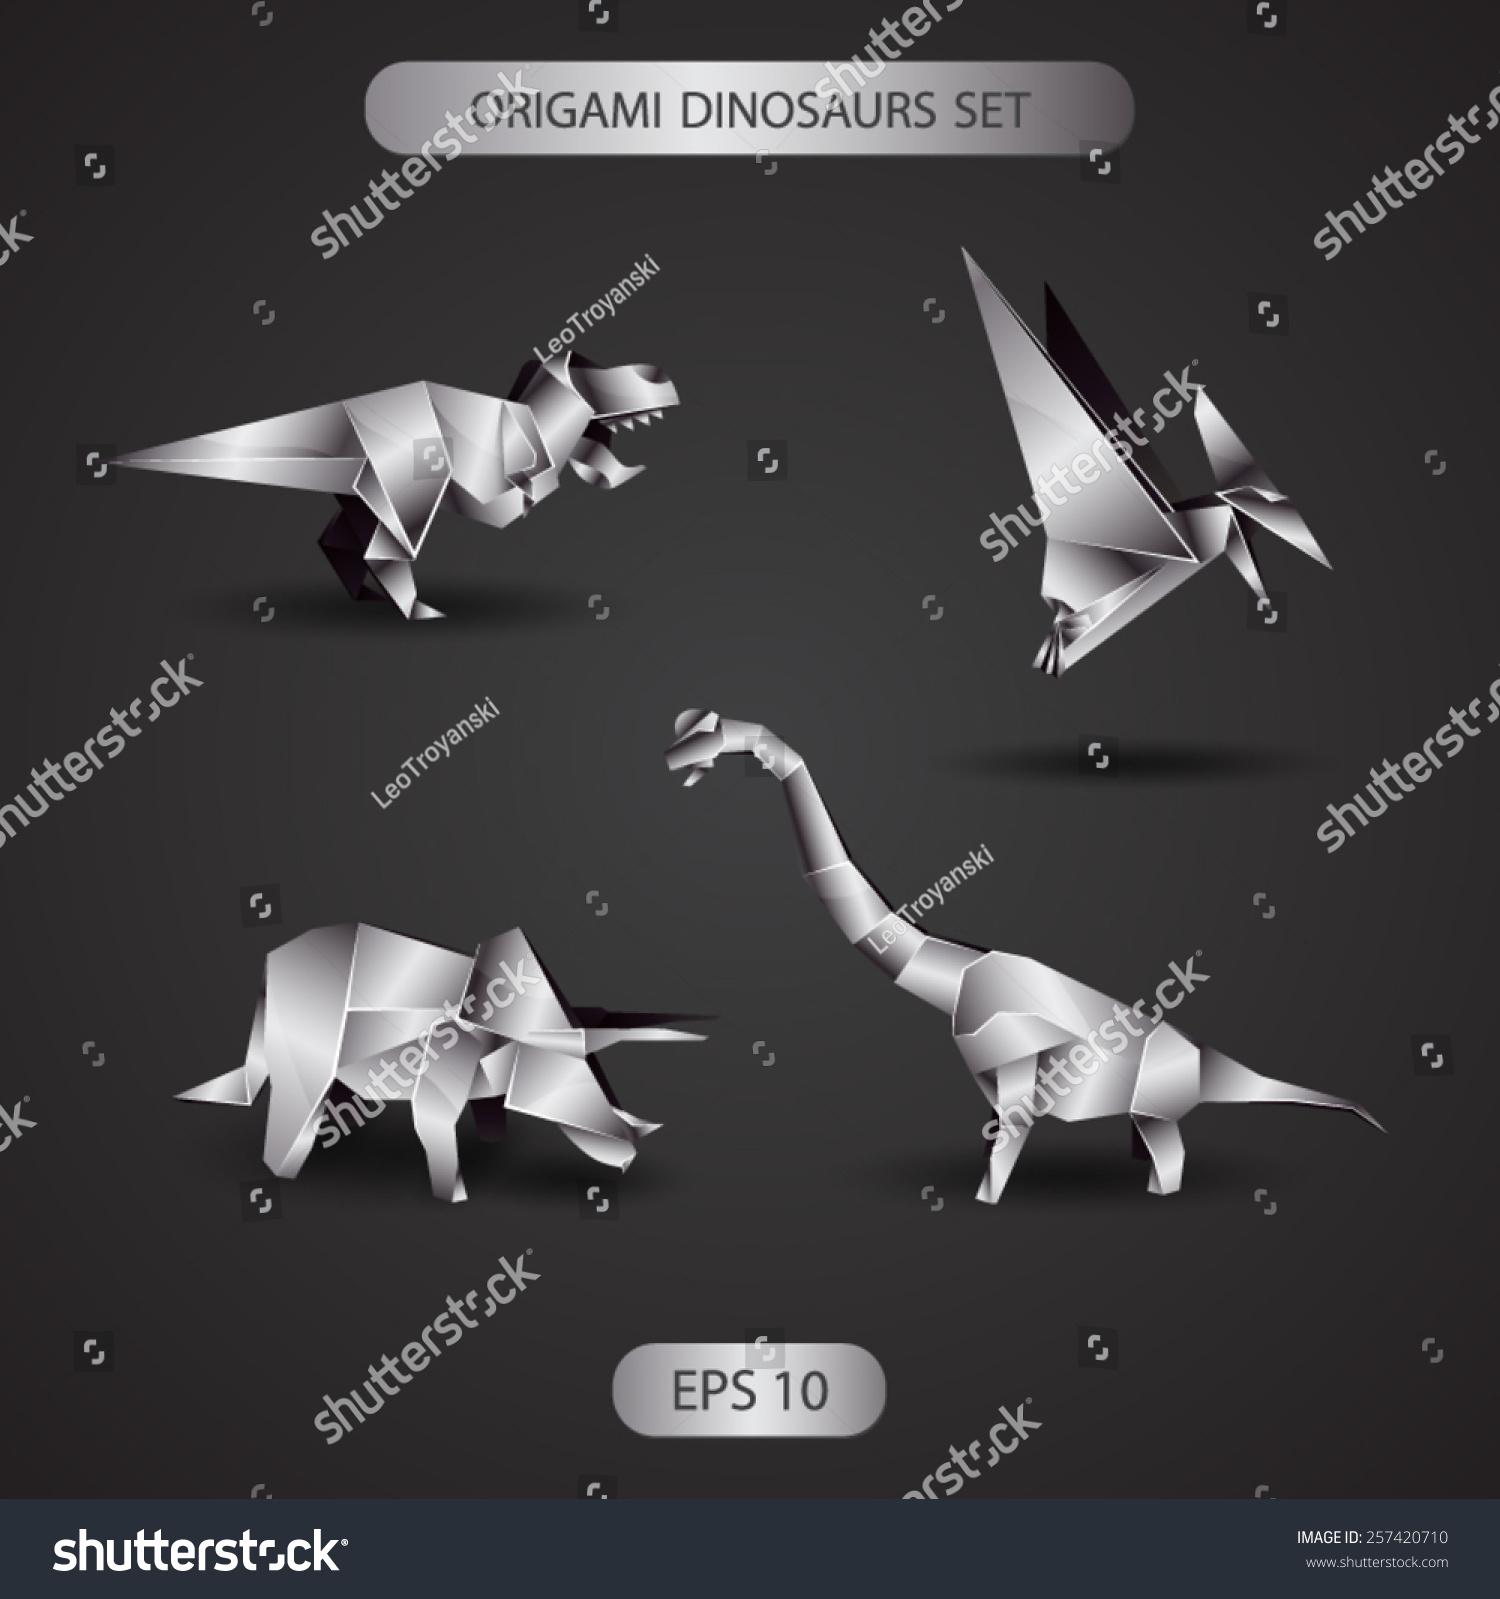 Chrome origami dinosaurs set stock vector 257420710 shutterstock chrome origami dinosaurs set jeuxipadfo Choice Image